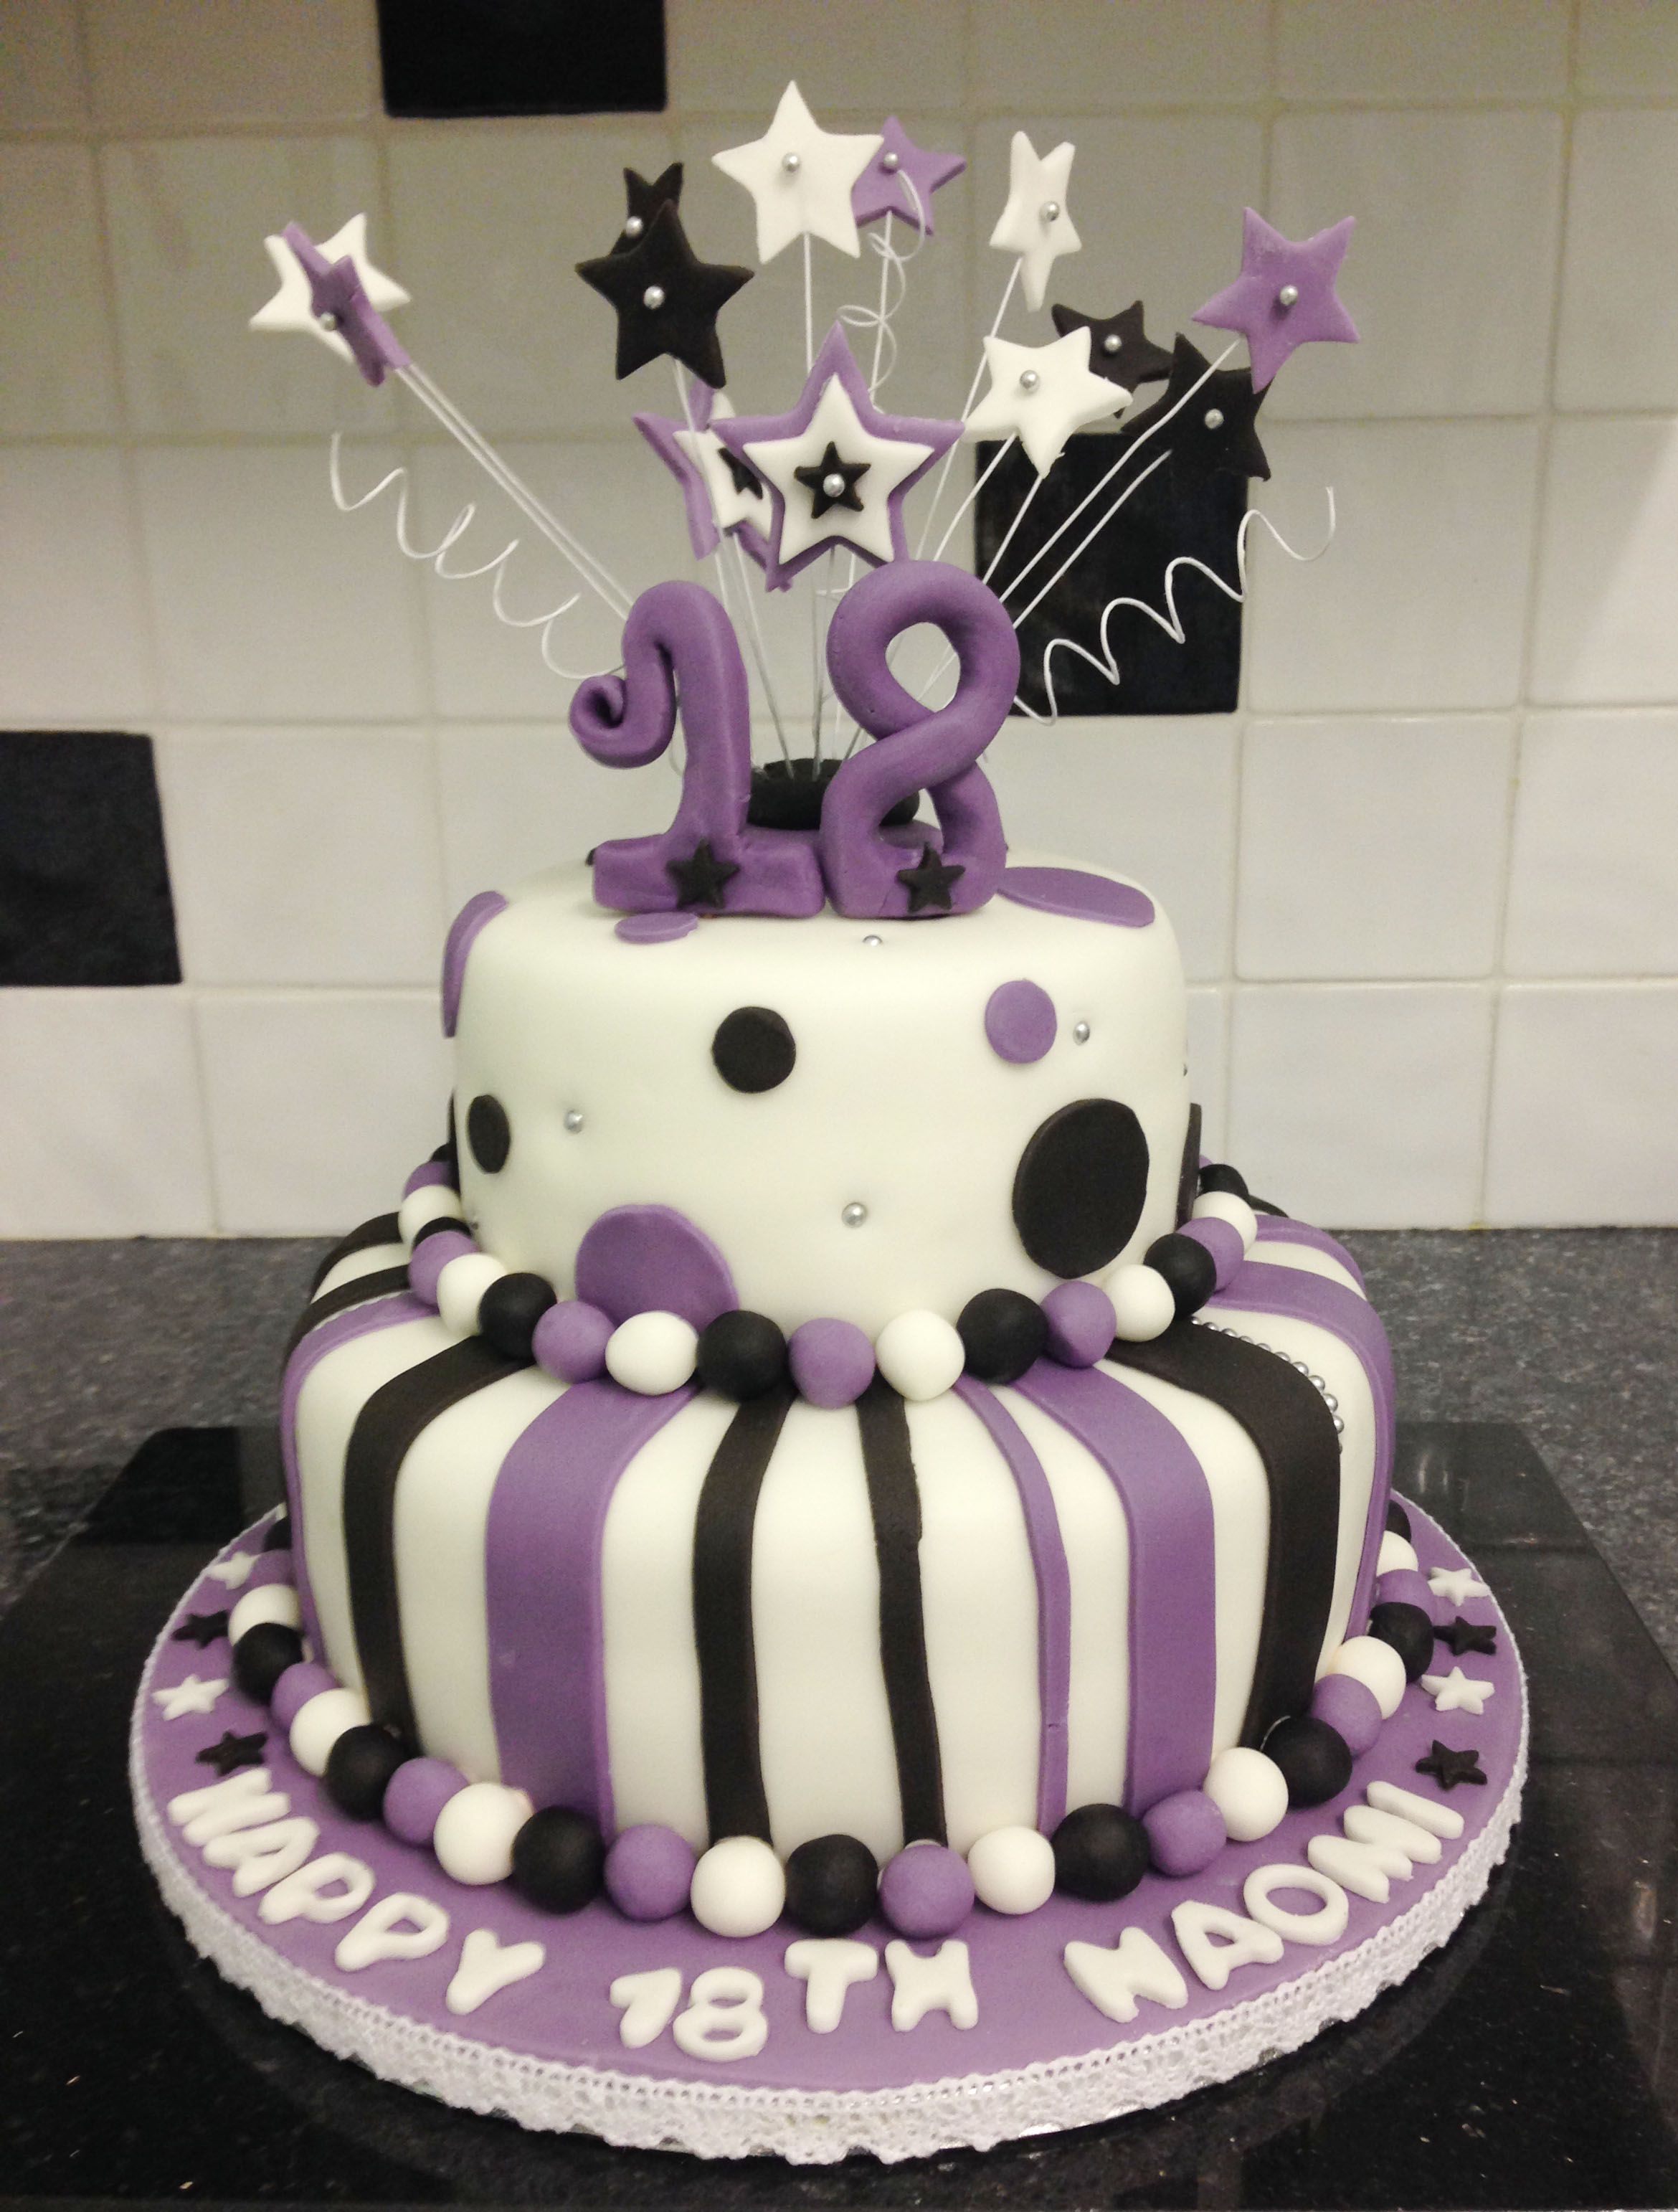 Two Tier Round 18th Birthday Cake White Purple And Black Stars